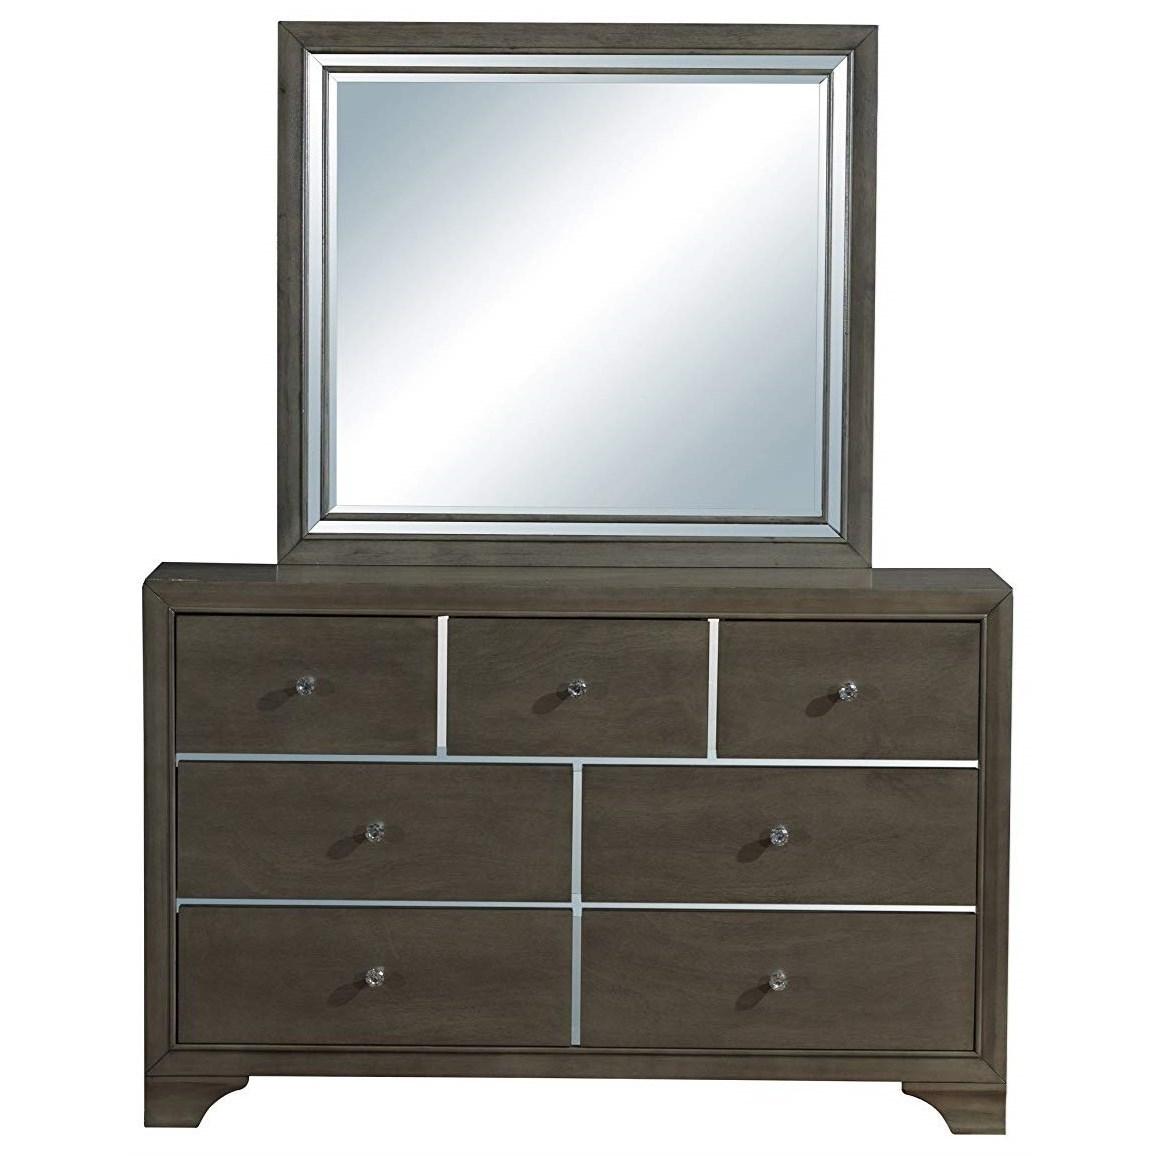 Cameron Dresser + Mirror Set by Global Furniture at Nassau Furniture and Mattress